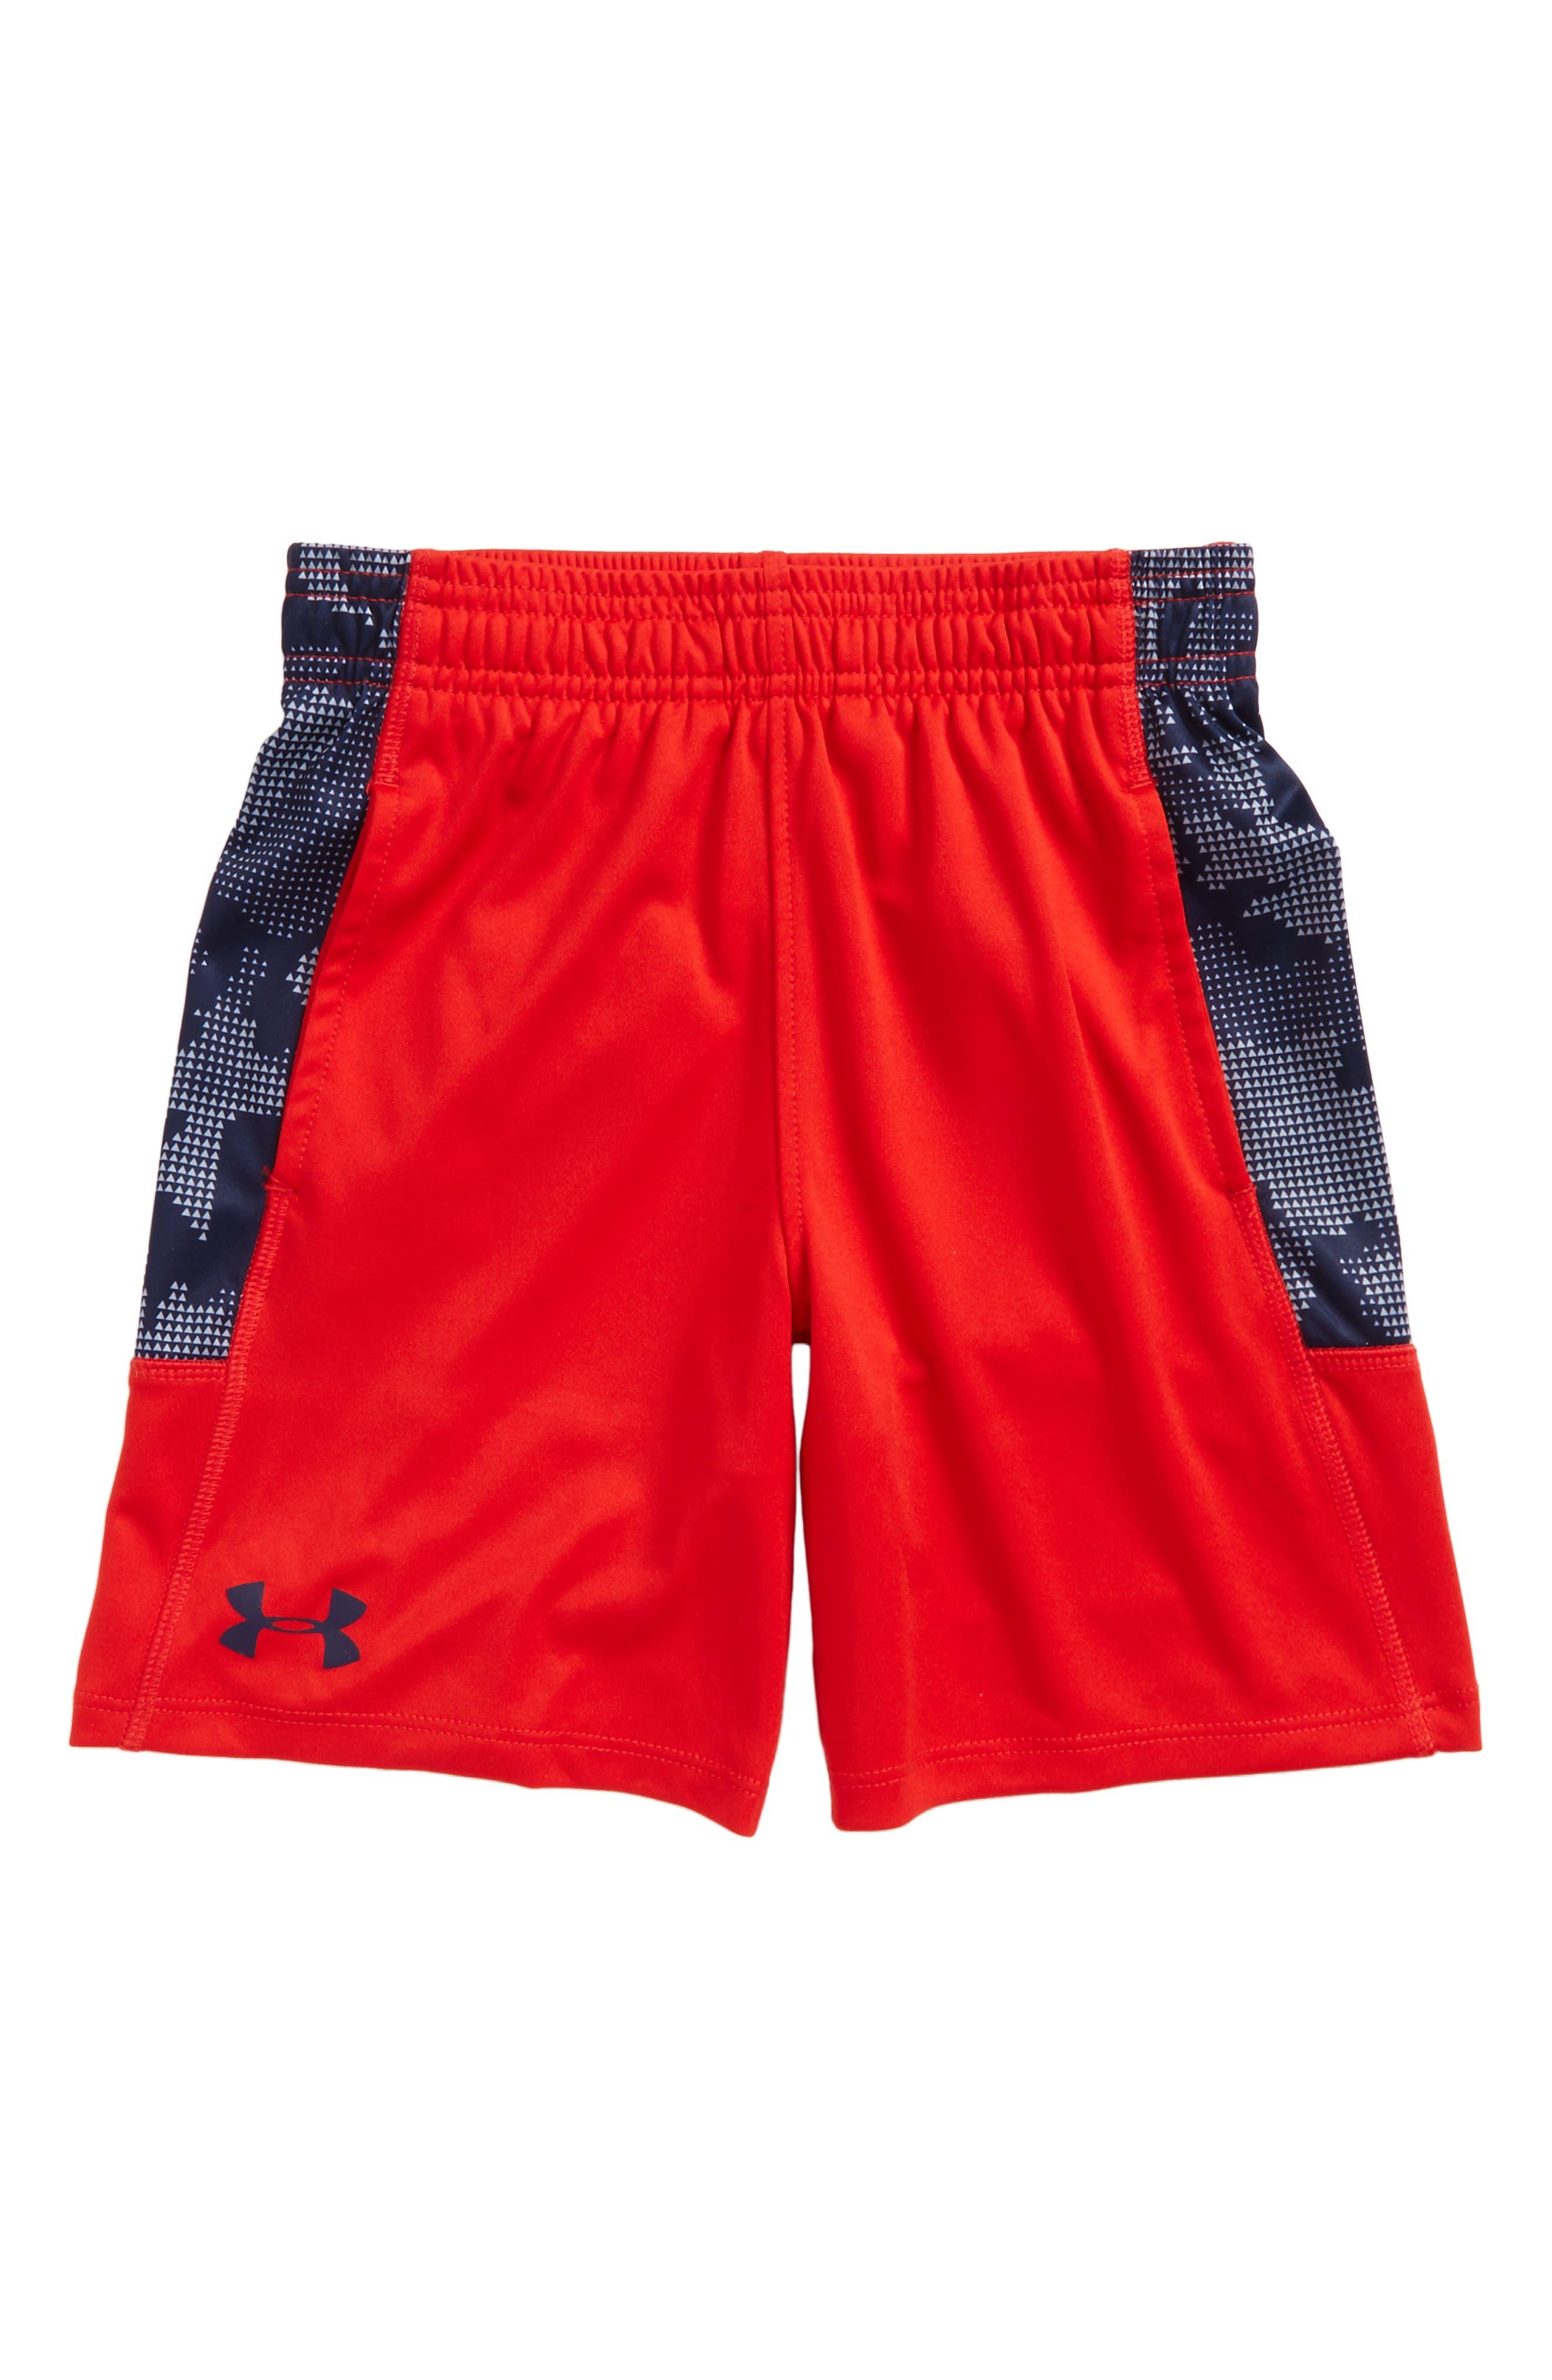 Utility Camo Stunt Athletic Shorts,                         Main,                         color,